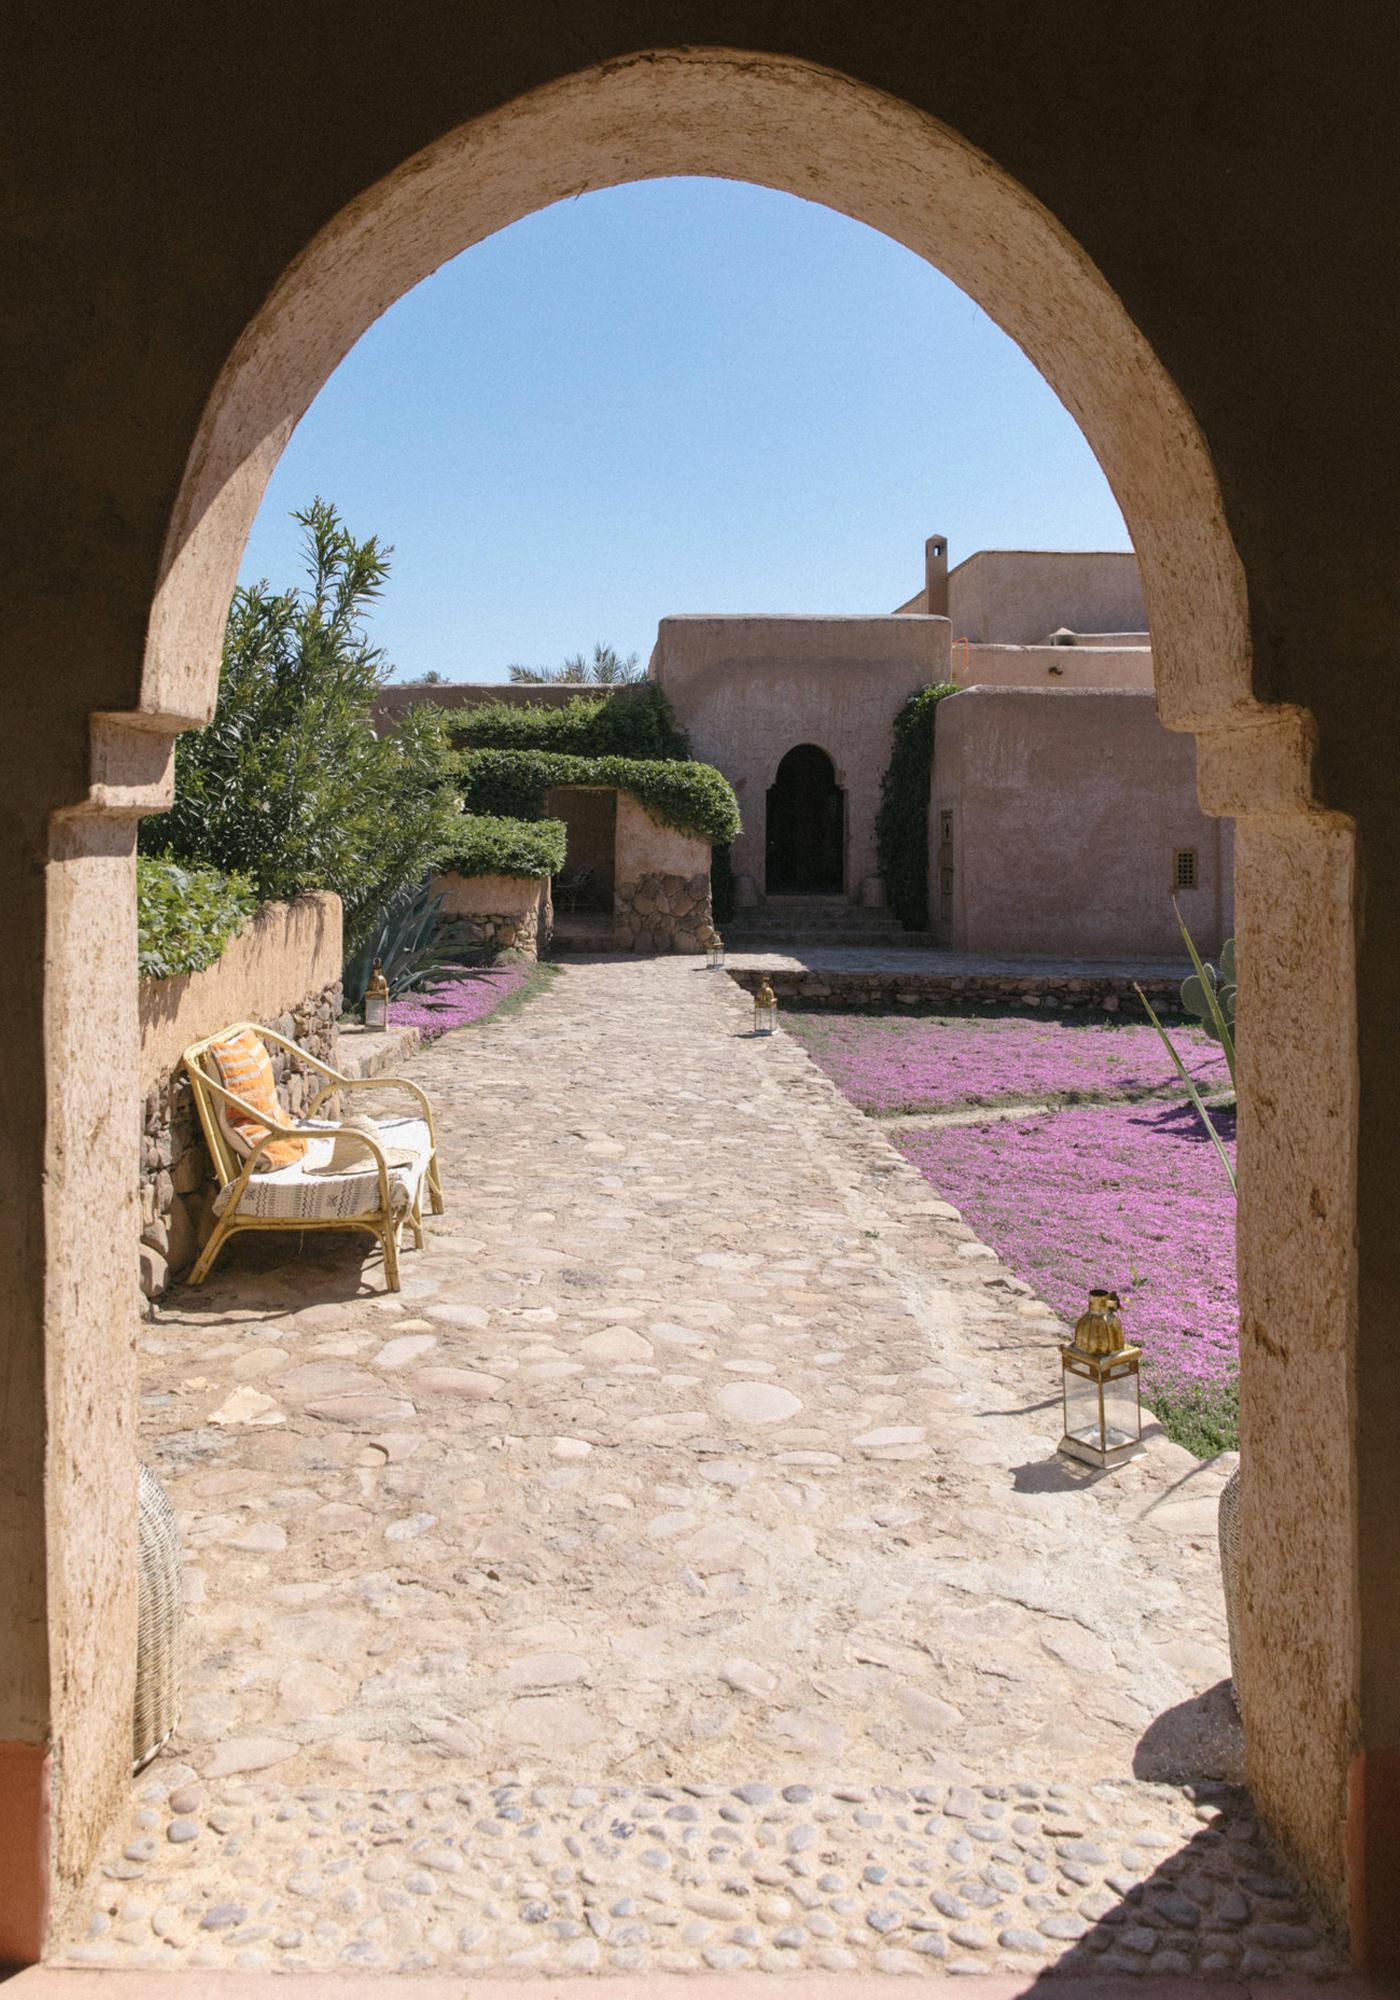 Berber Lodge Hotel Maison Oumnas Maroc Architecture